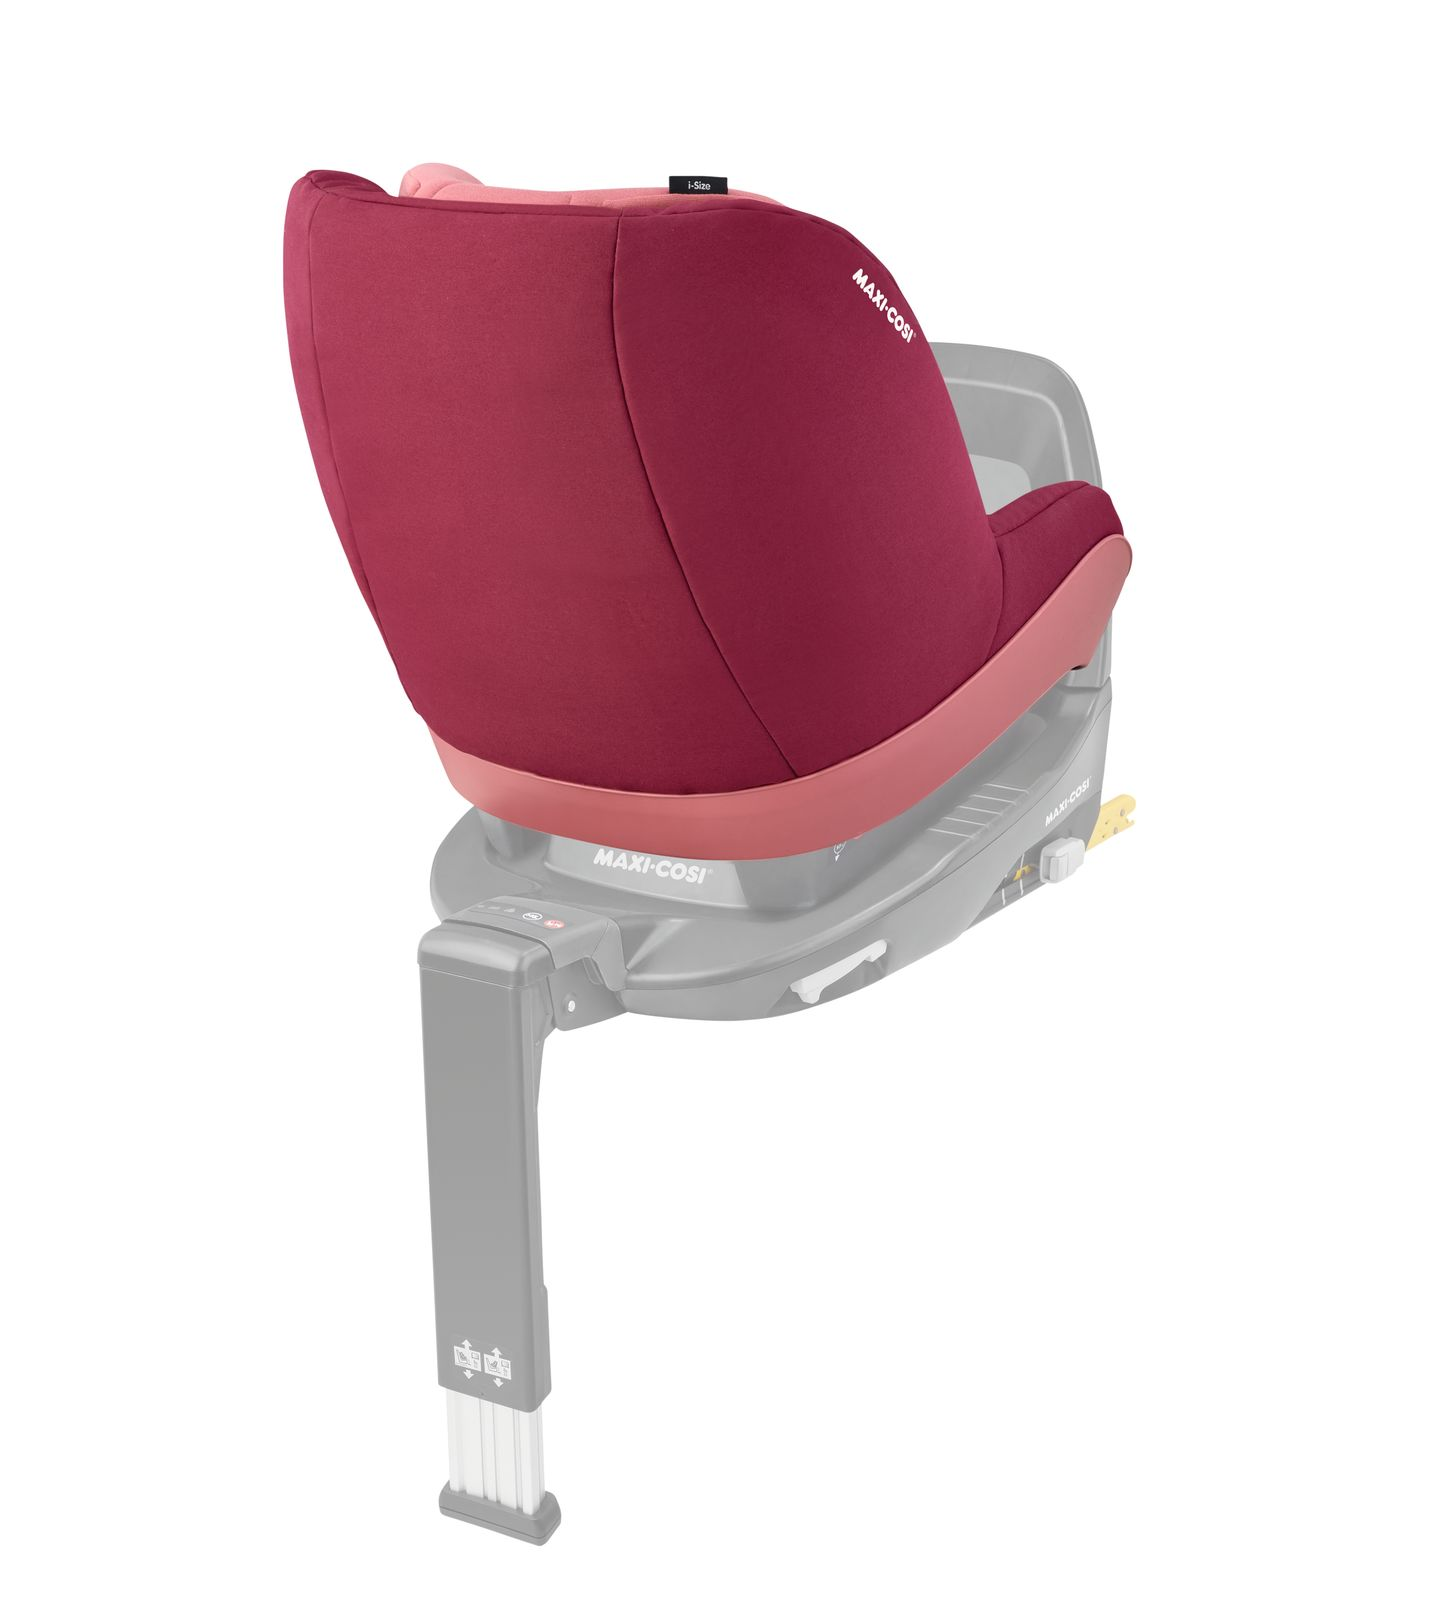 maxi cosi pearl pro i size reboard kindersitz die zwergperten babyschalen reboarder. Black Bedroom Furniture Sets. Home Design Ideas